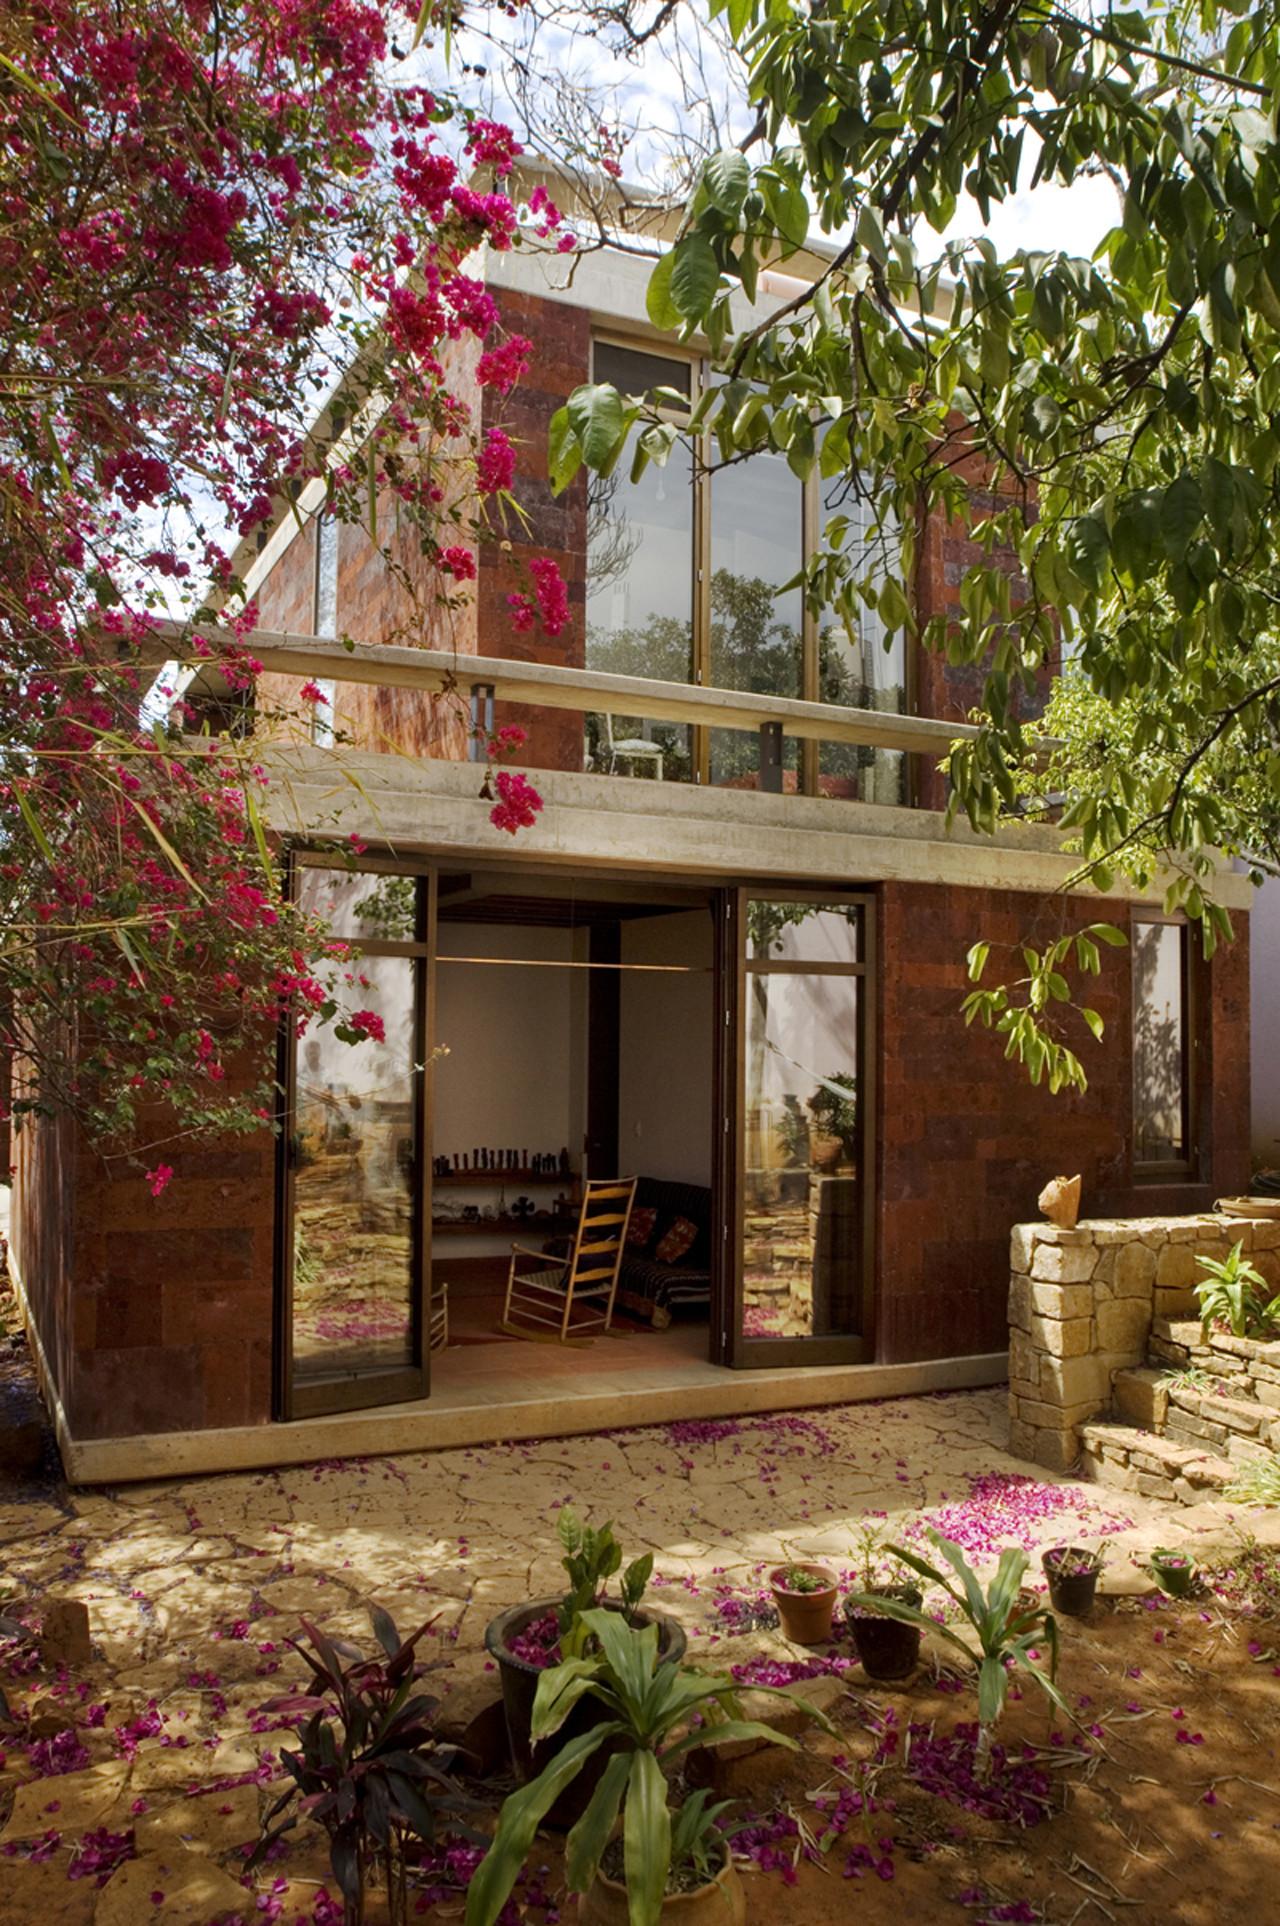 Casa estudio oaxaca taller de arquitectura mauricio for Estudio de arquitectura